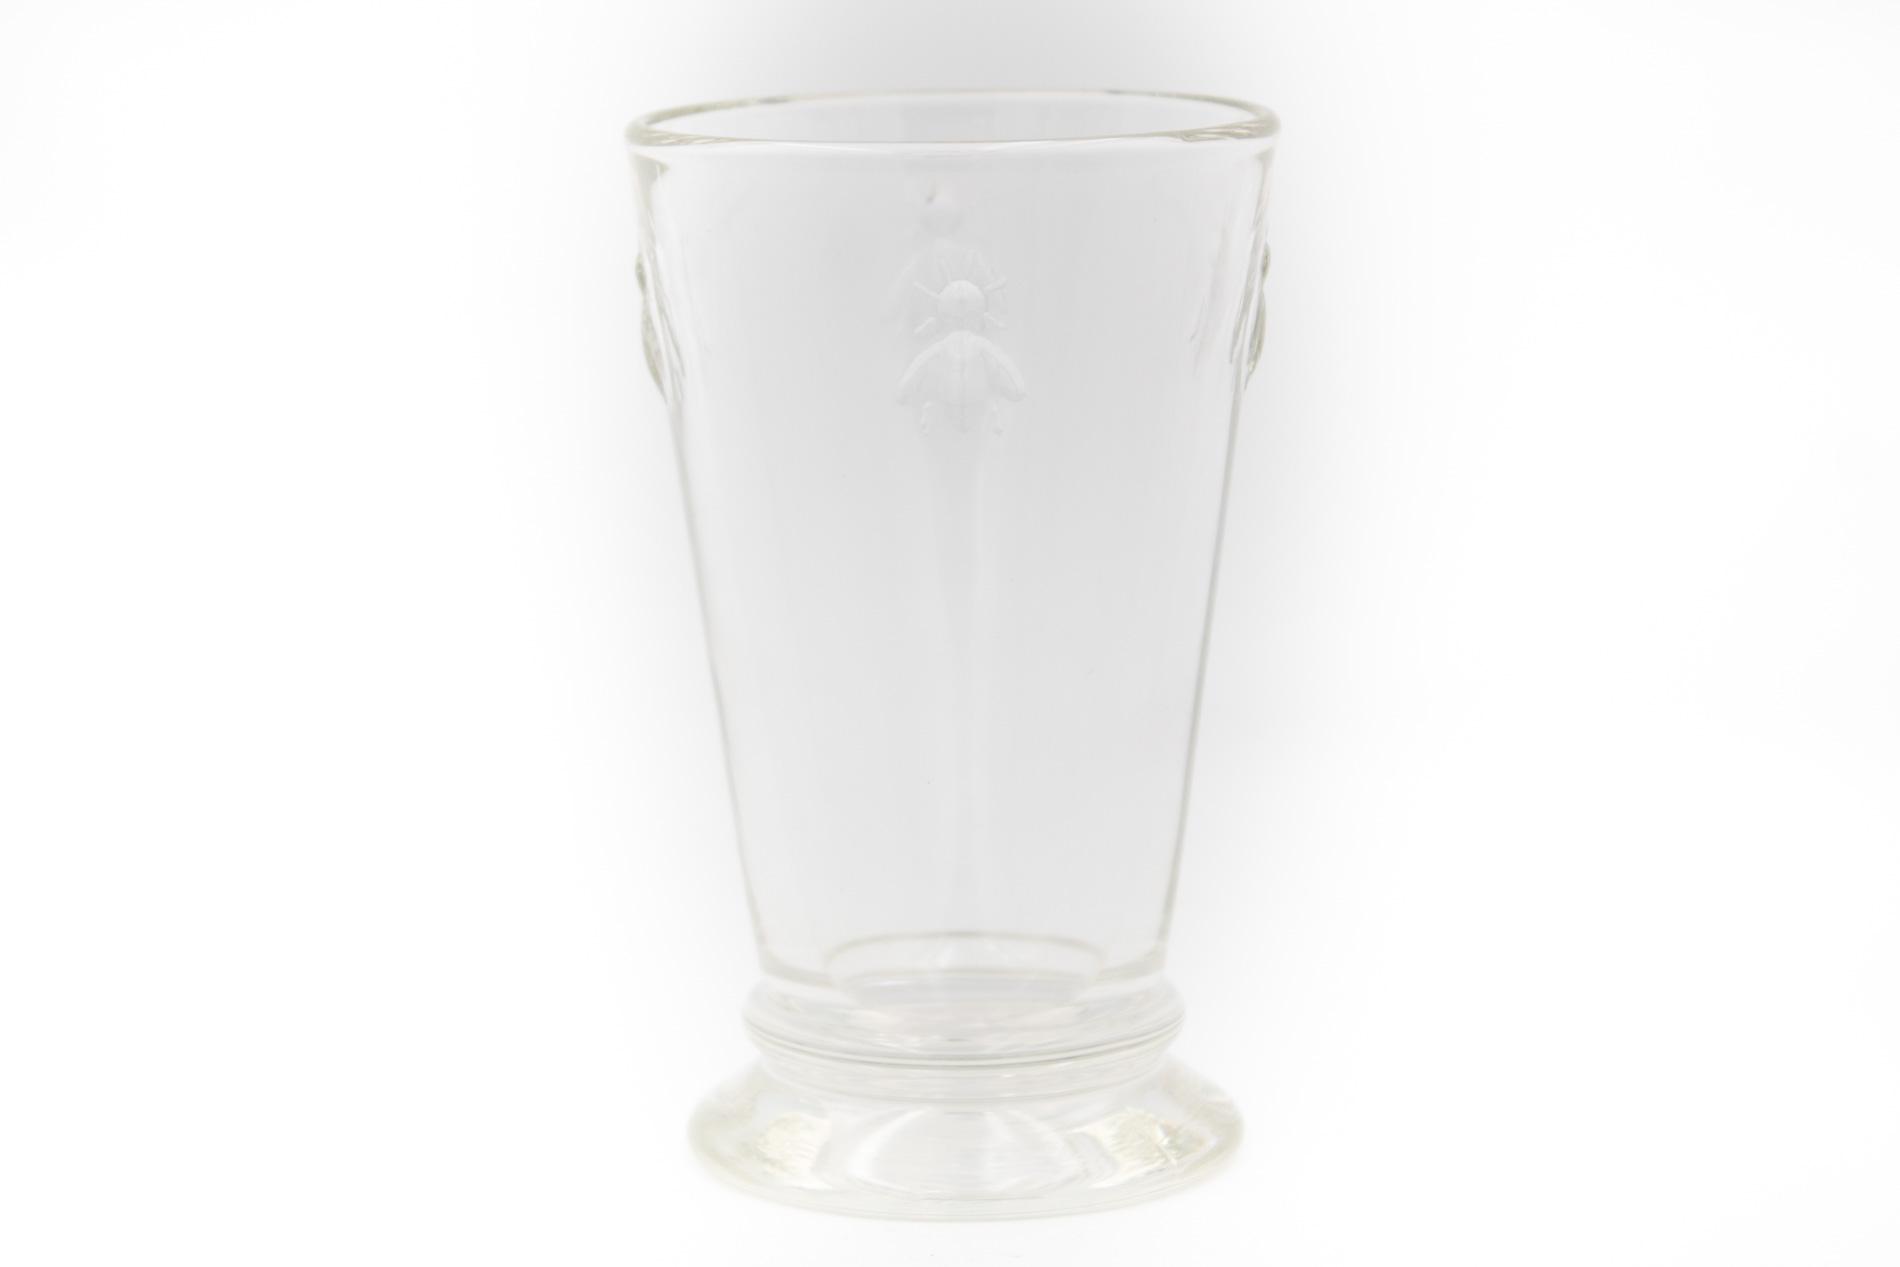 Longdrinkglas Biene, 0,35 l